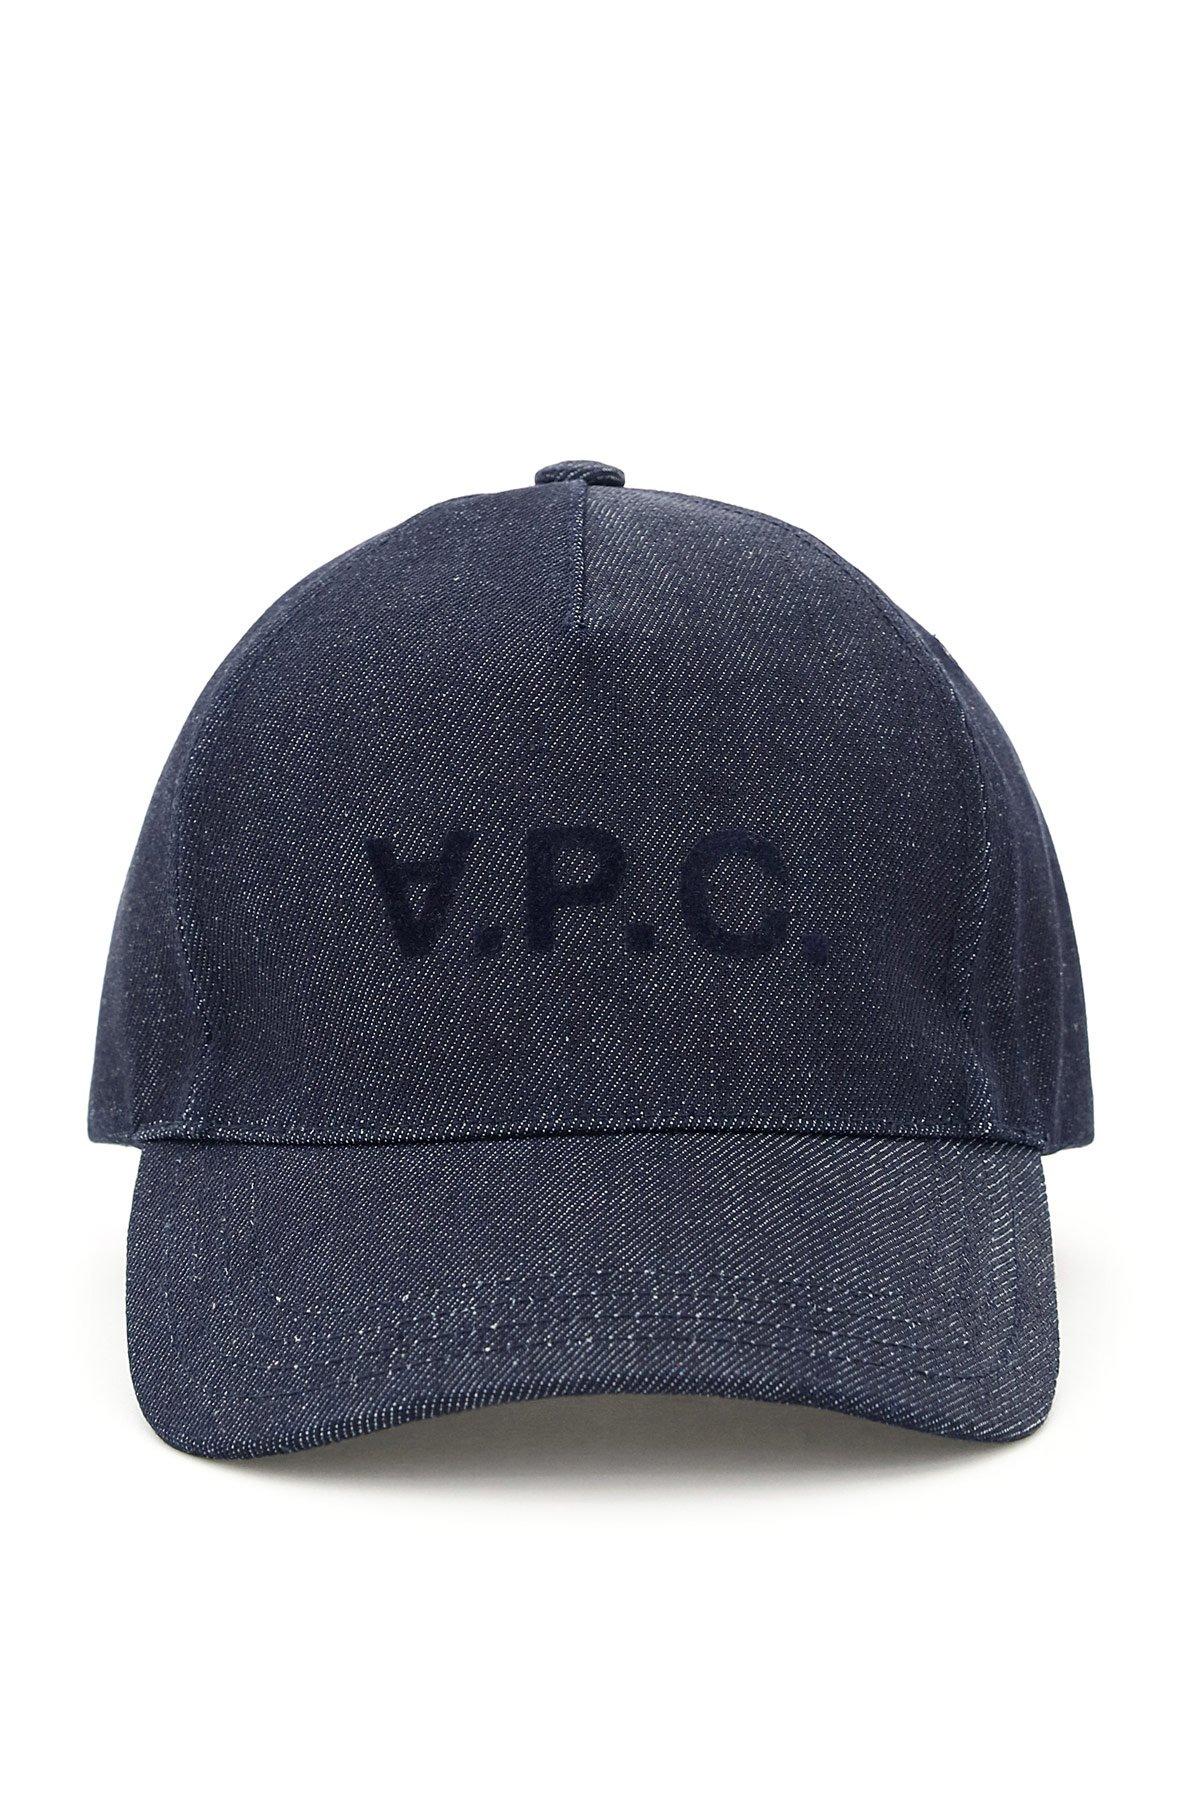 A.p.c. cappello baseball denim eden